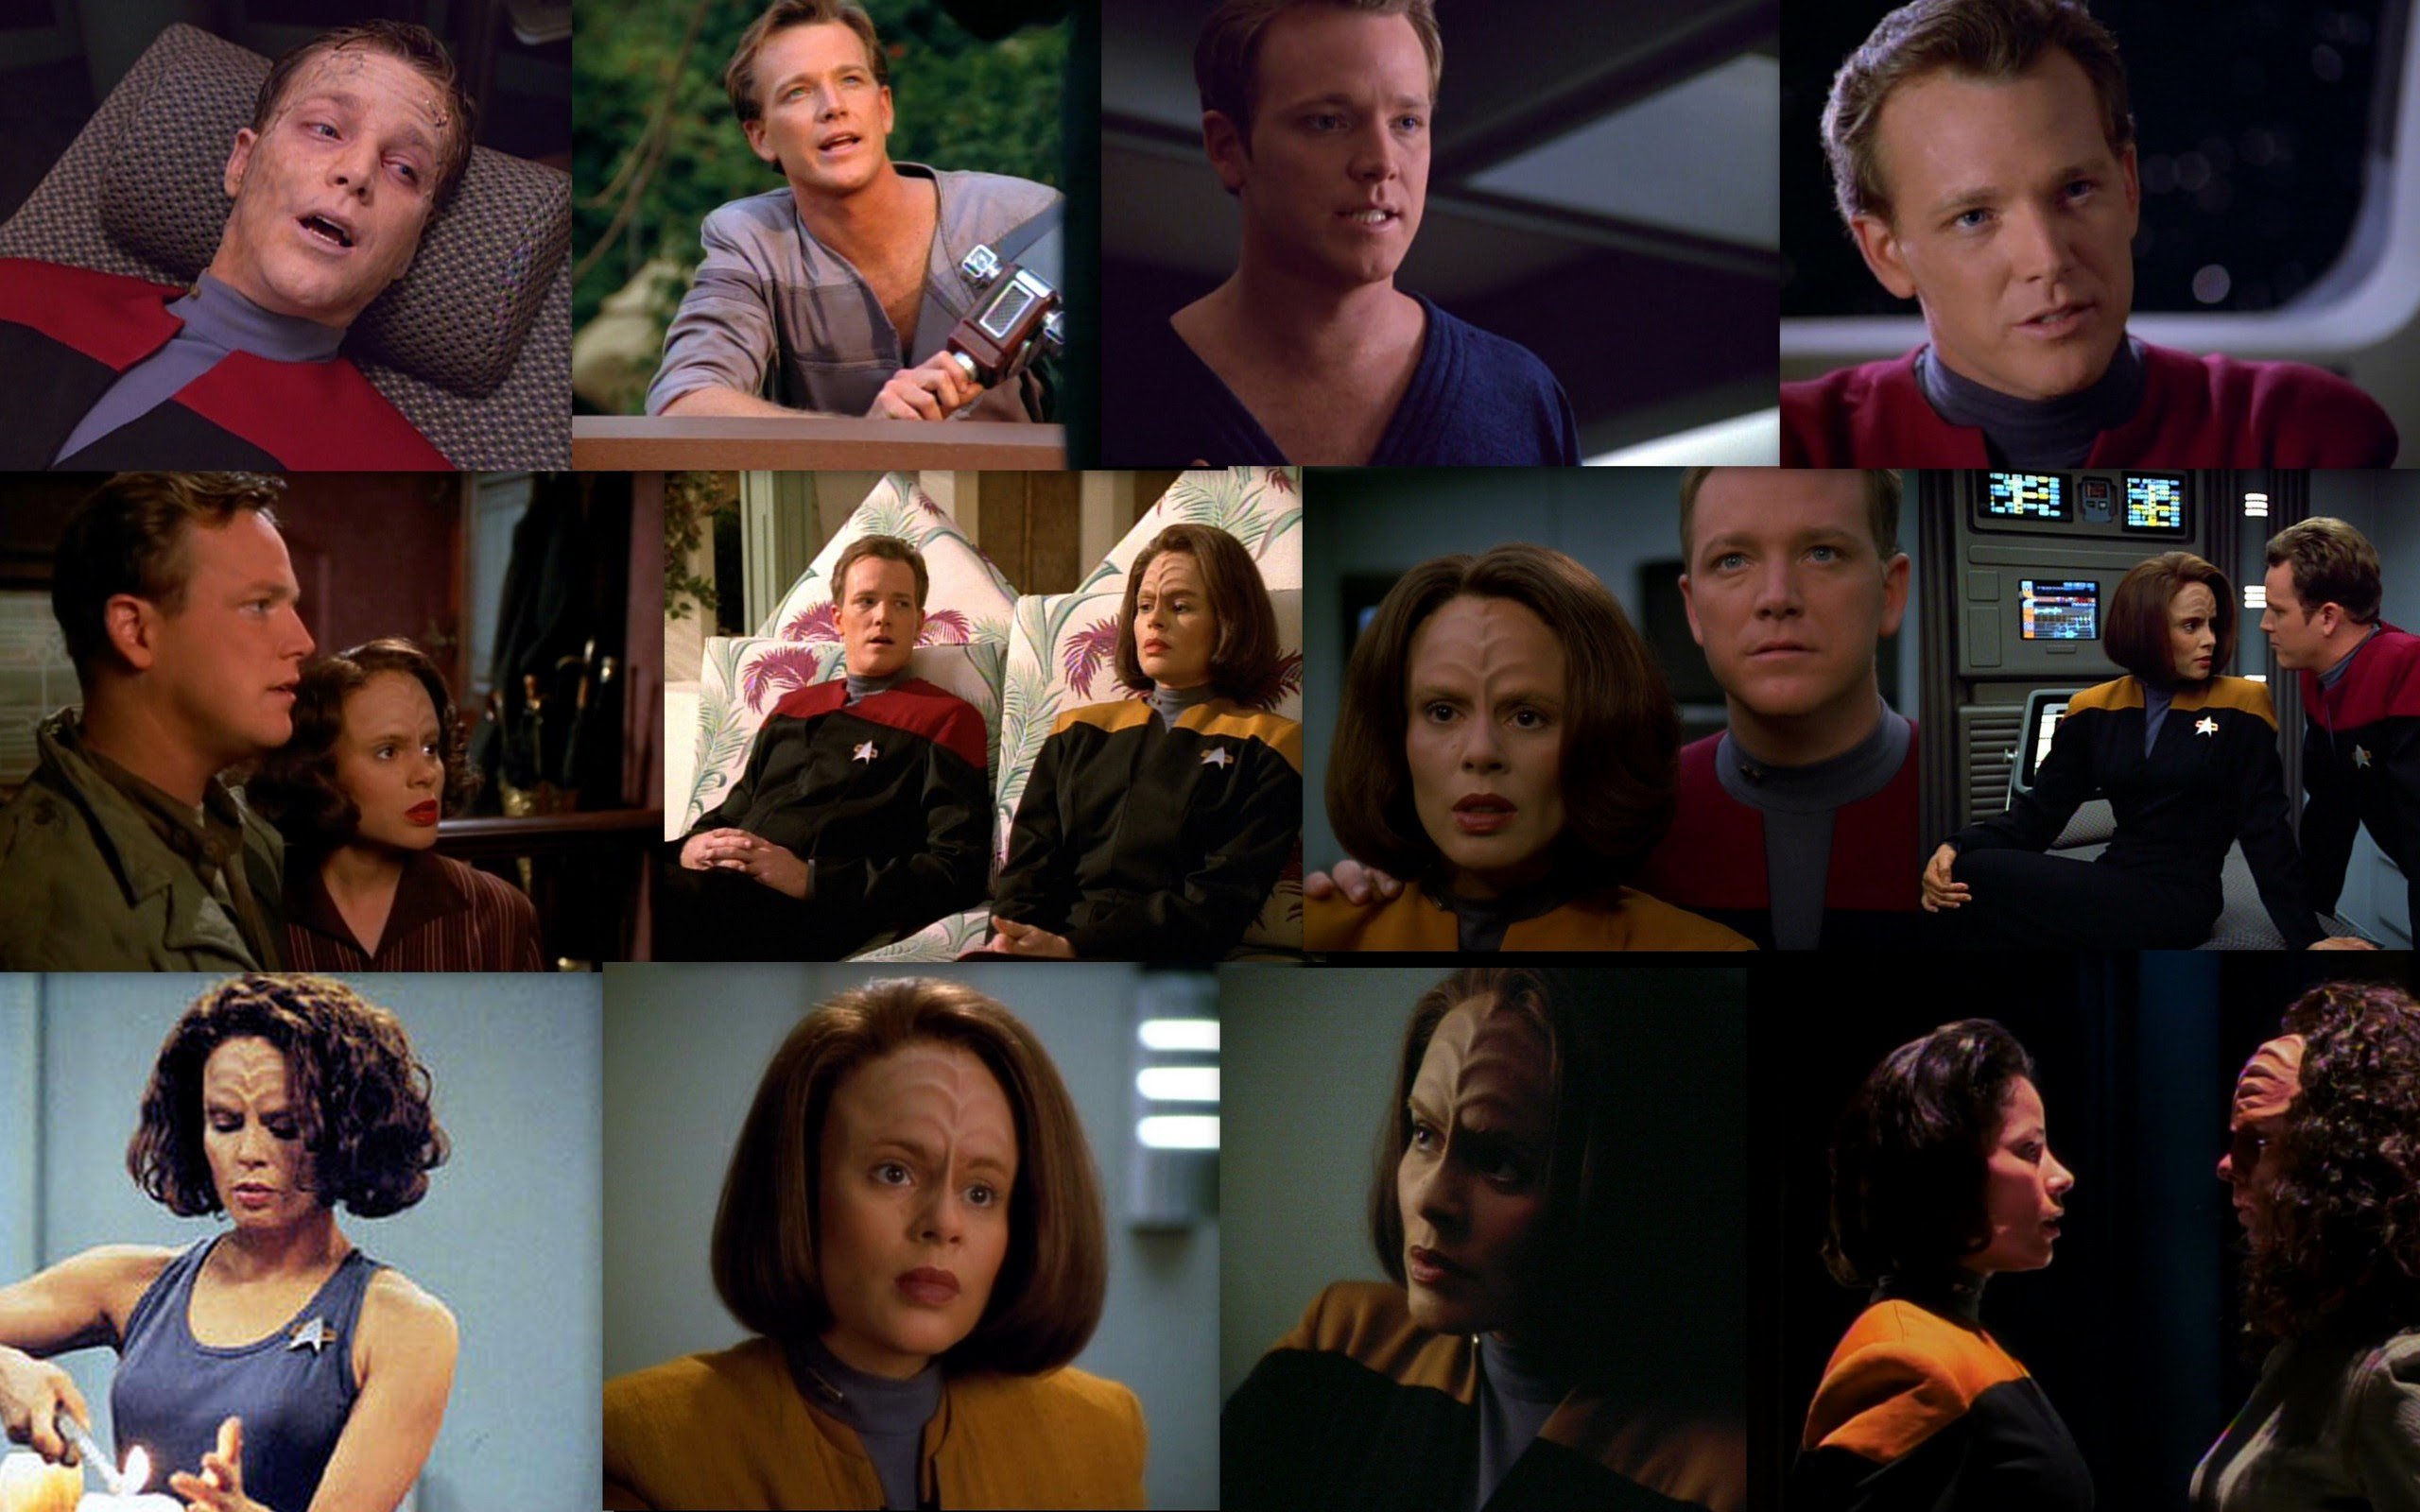 Wallpapers - Star Trek Voyager